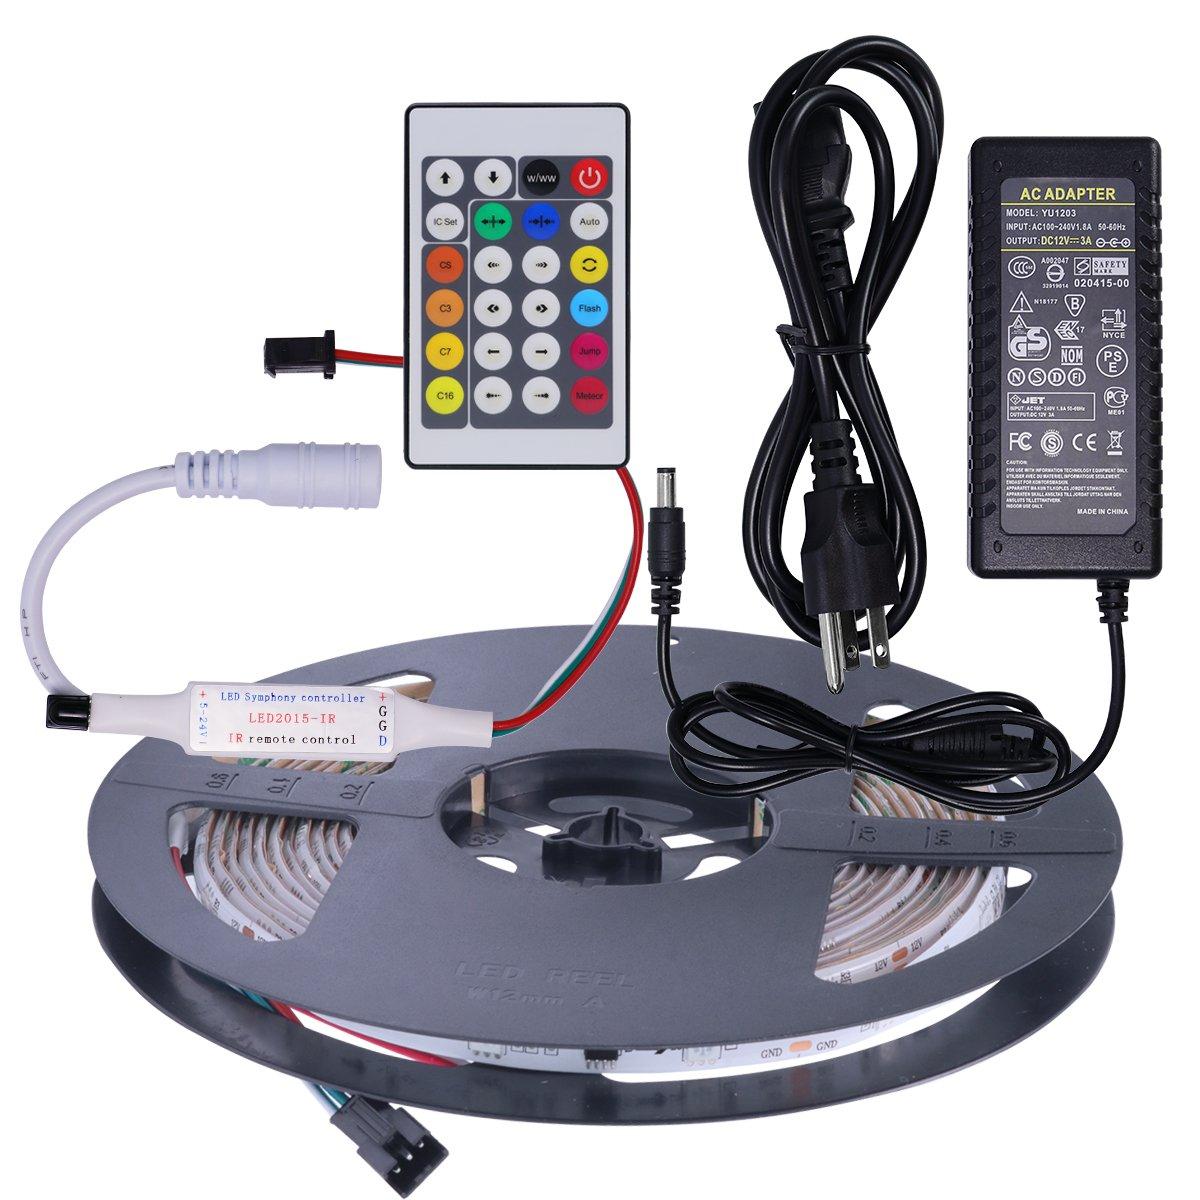 Mokungit WS2811 LED Strip Light 16.4ft 30 LEDs/m RGB DC12V White PCB Waterproof IP65 Digital Dream Color Addressable LED Strip with 24Key IR Remote Controller&12V 3A Power Supply